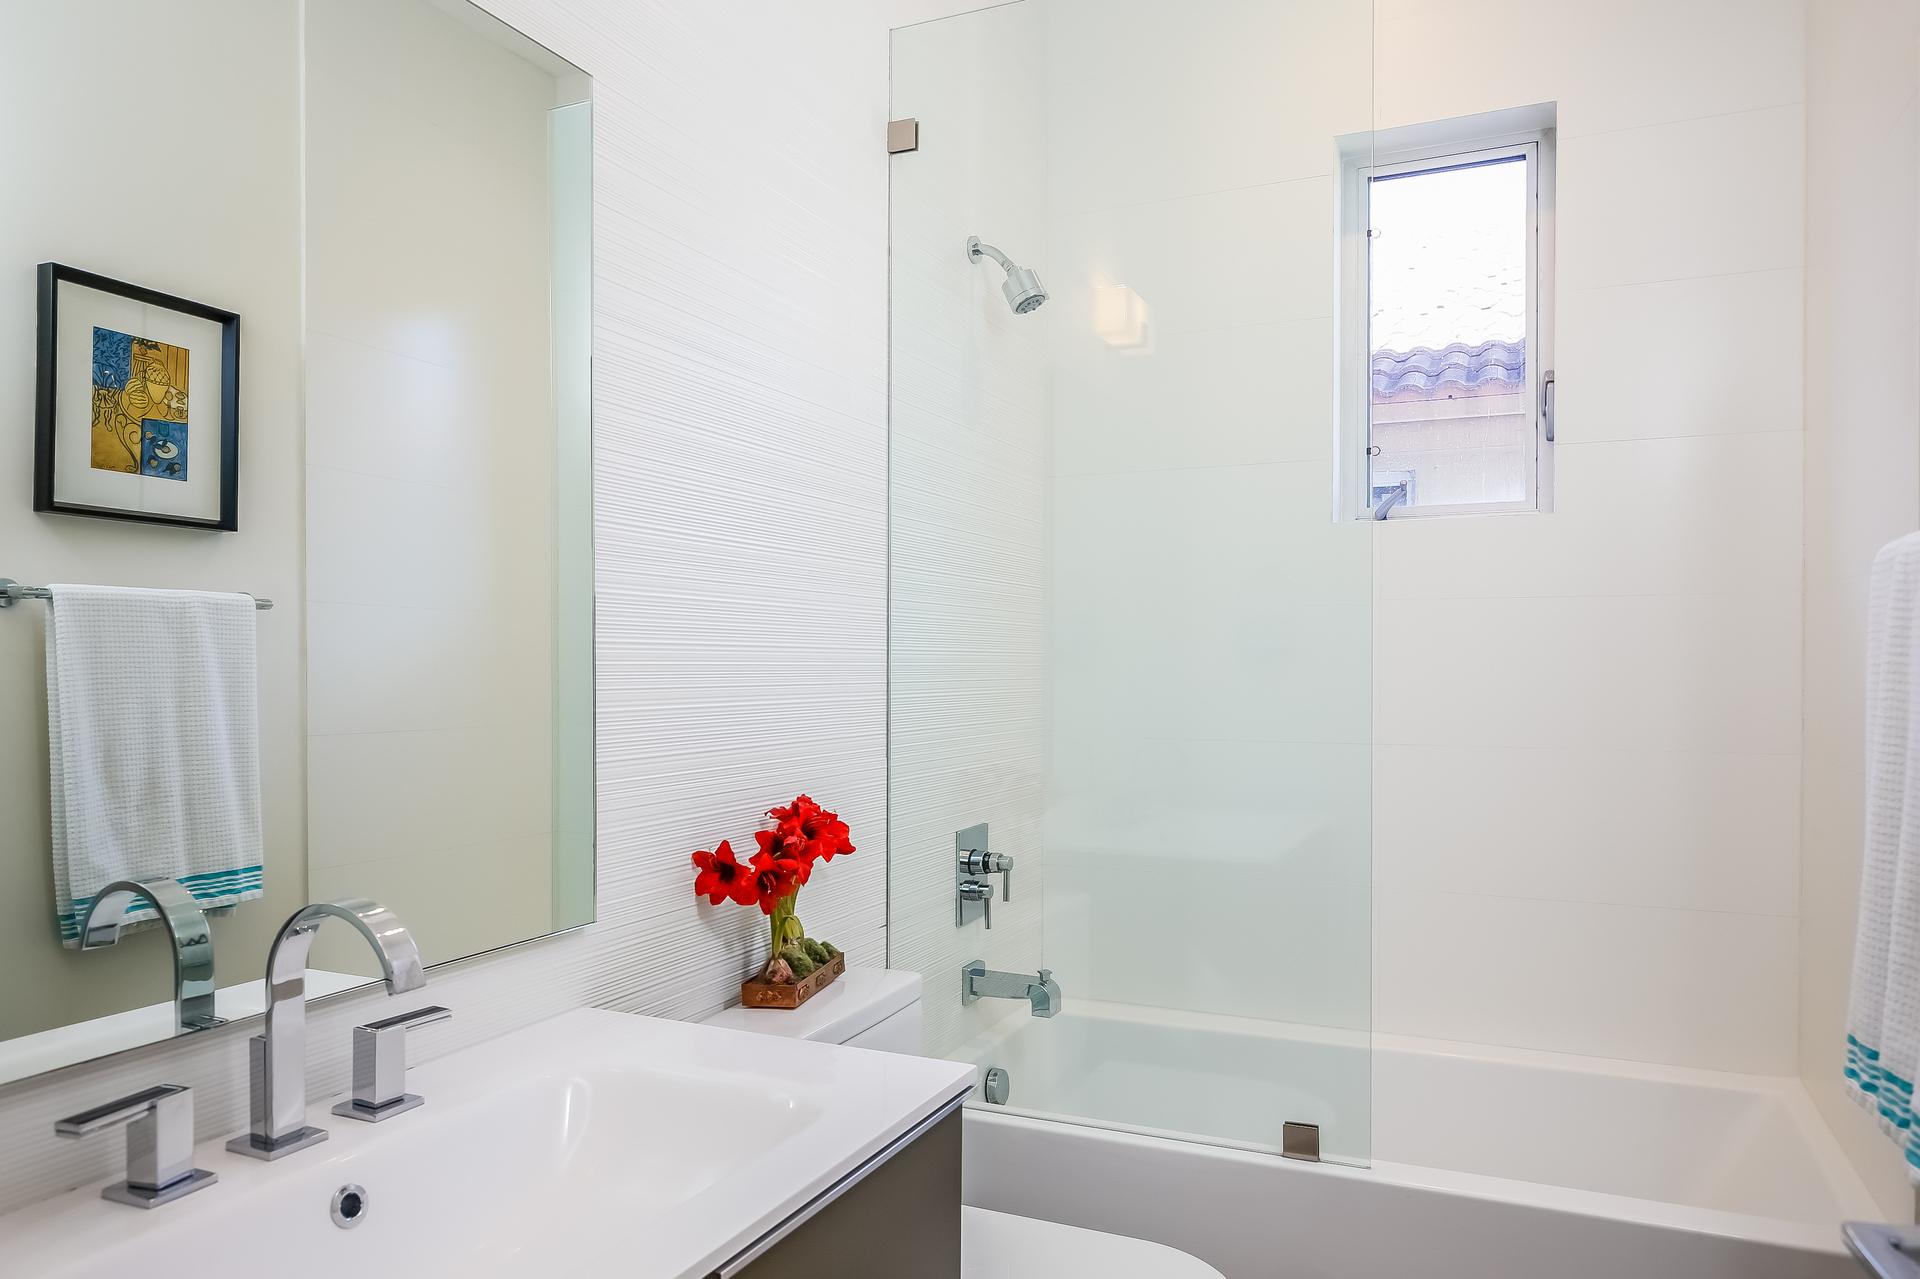 026-Bathroom-5037894-medium